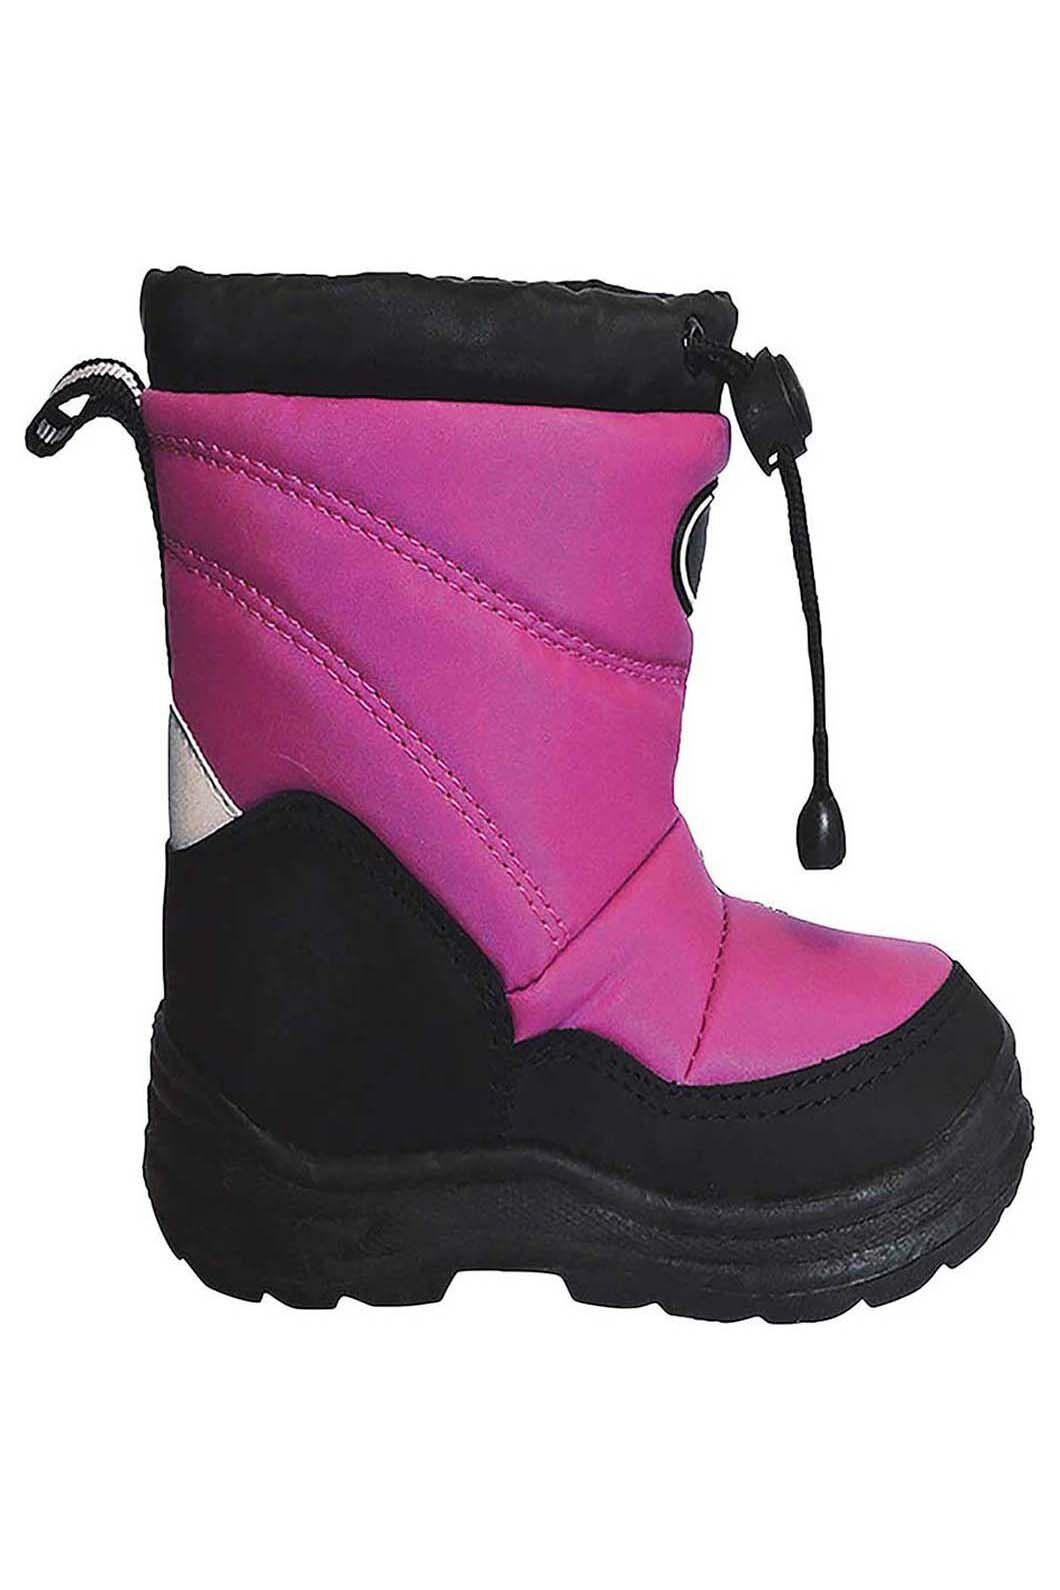 XTM Kids' Puddles Gumboots, Hot Pink, hi-res